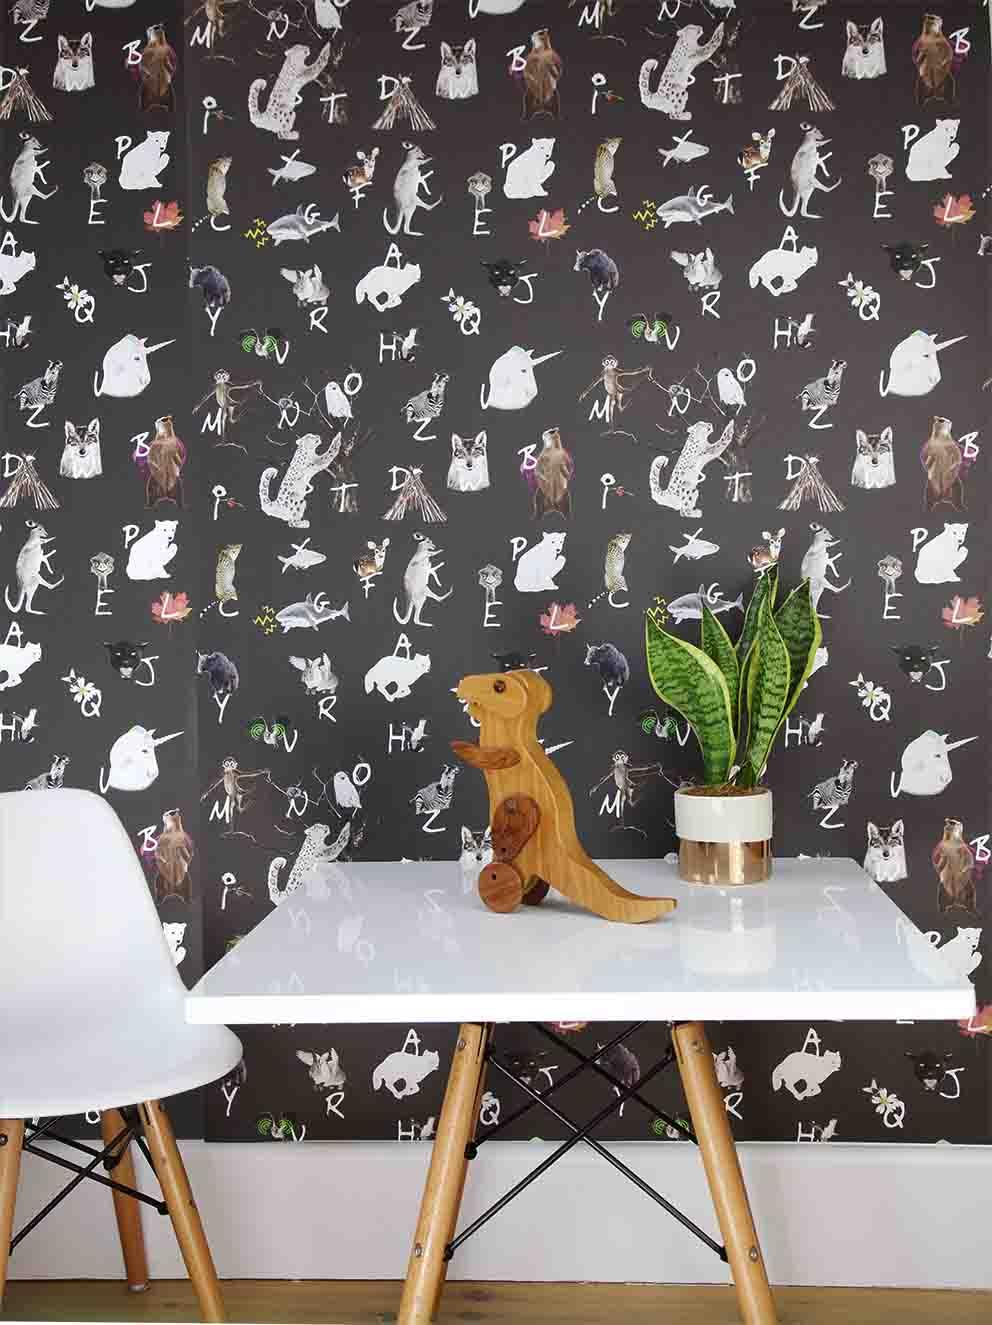 Animal Print Wallpaper For Bedrooms A Z Animal Alphabet Charcoal Base Children S Bedroom